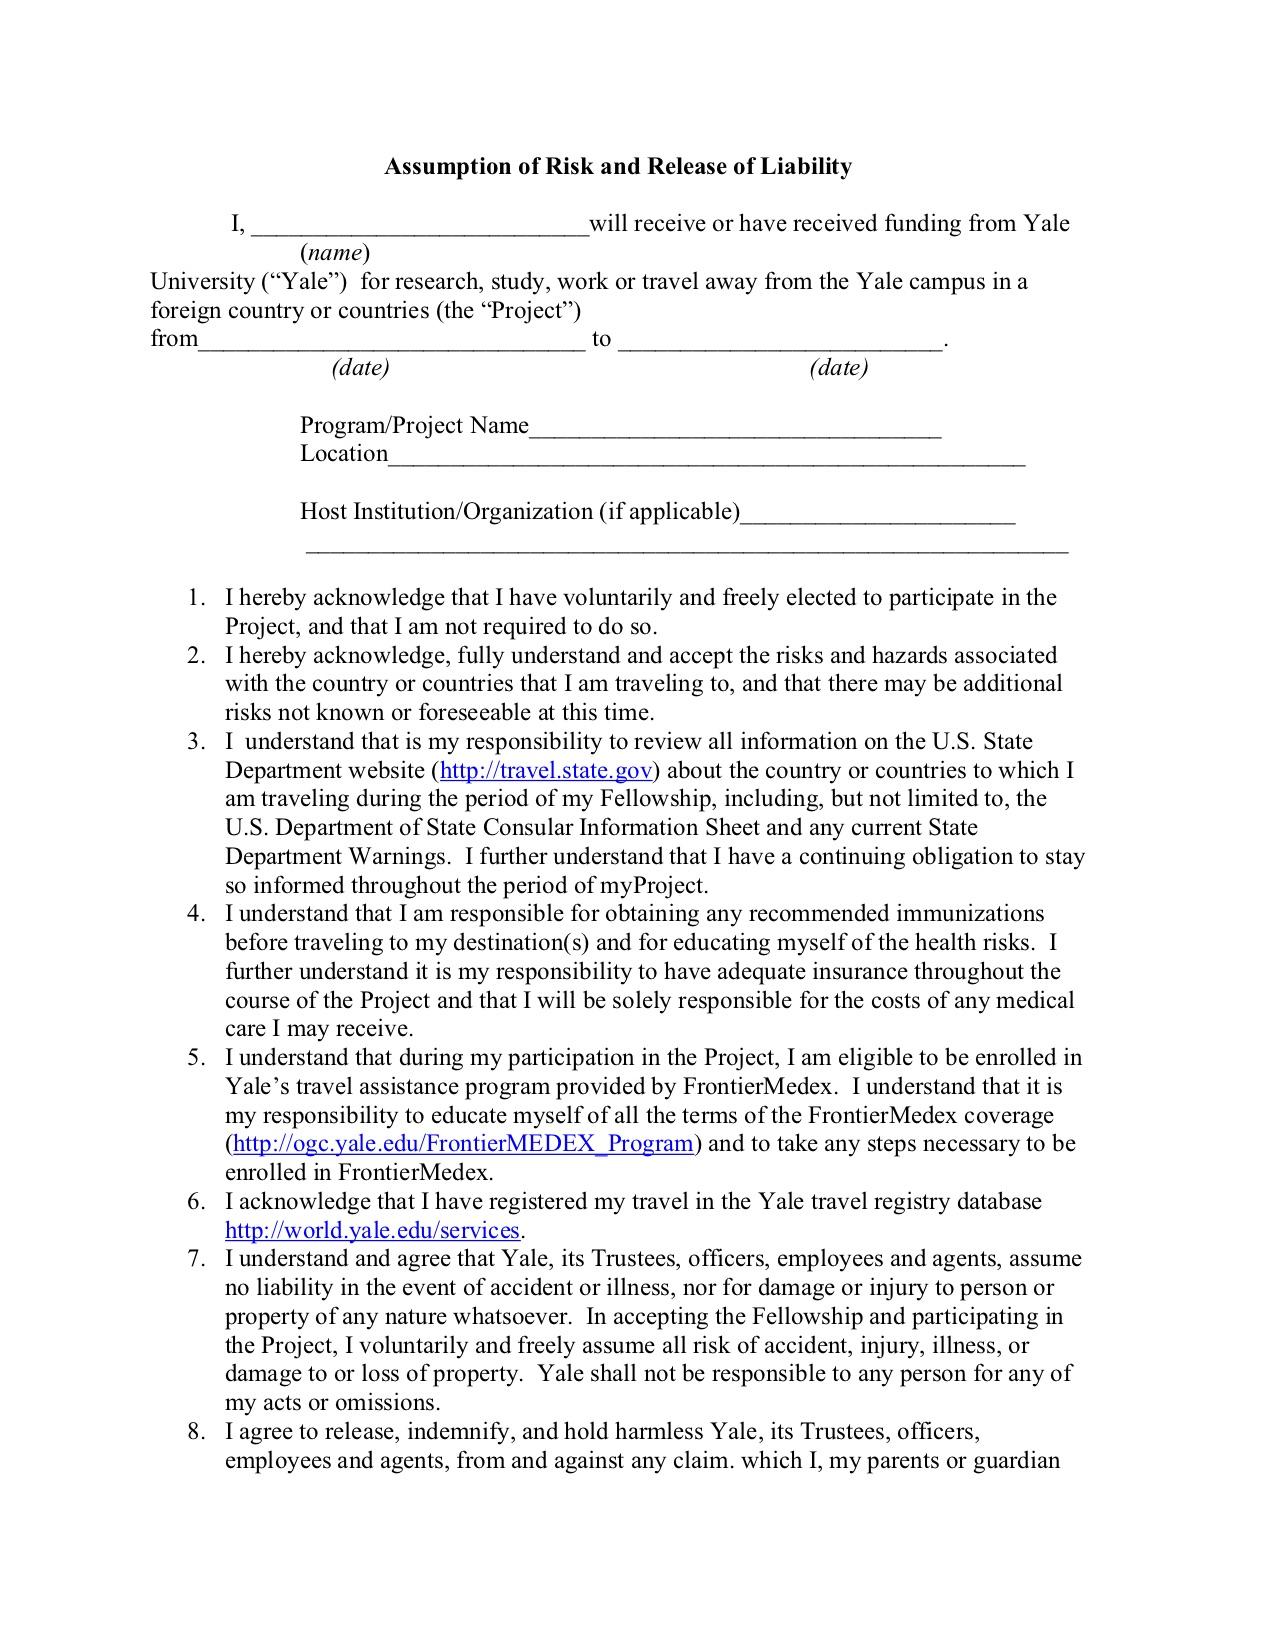 YLS Revised International Travel Waiver 033114.jpg